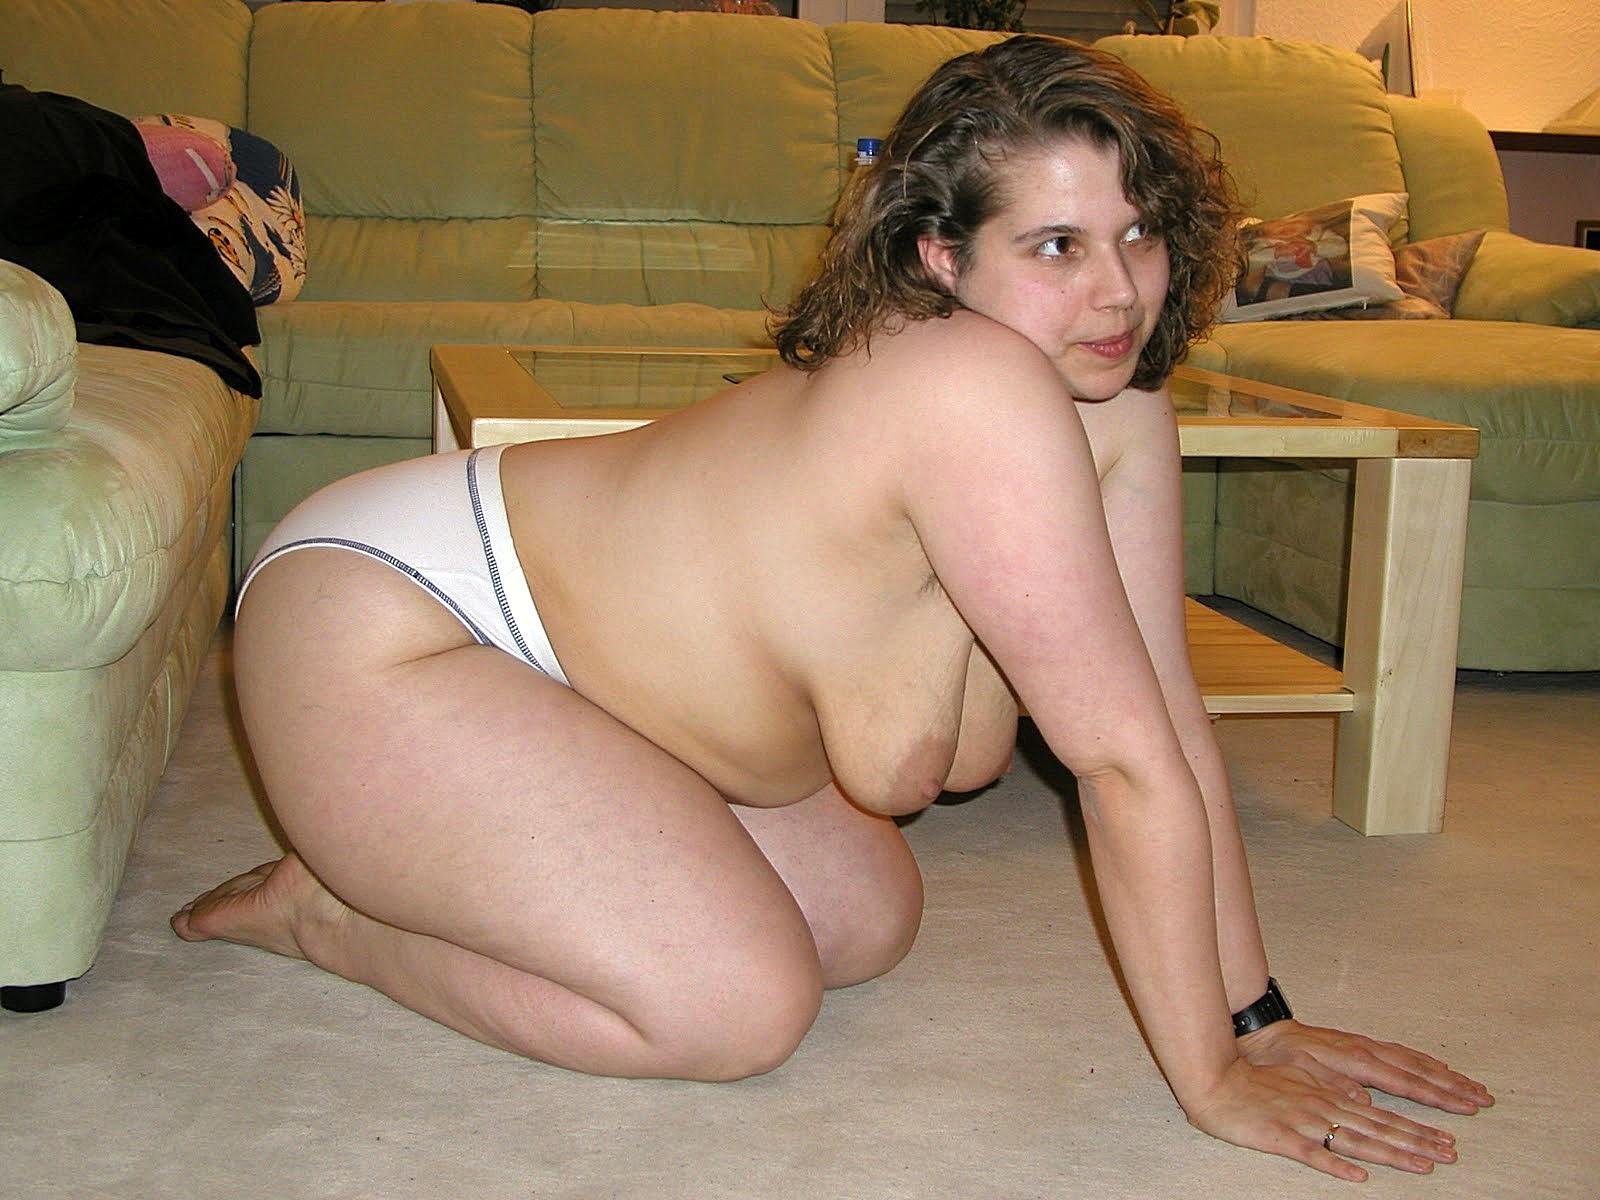 Chubby Teenie-Sextbänder